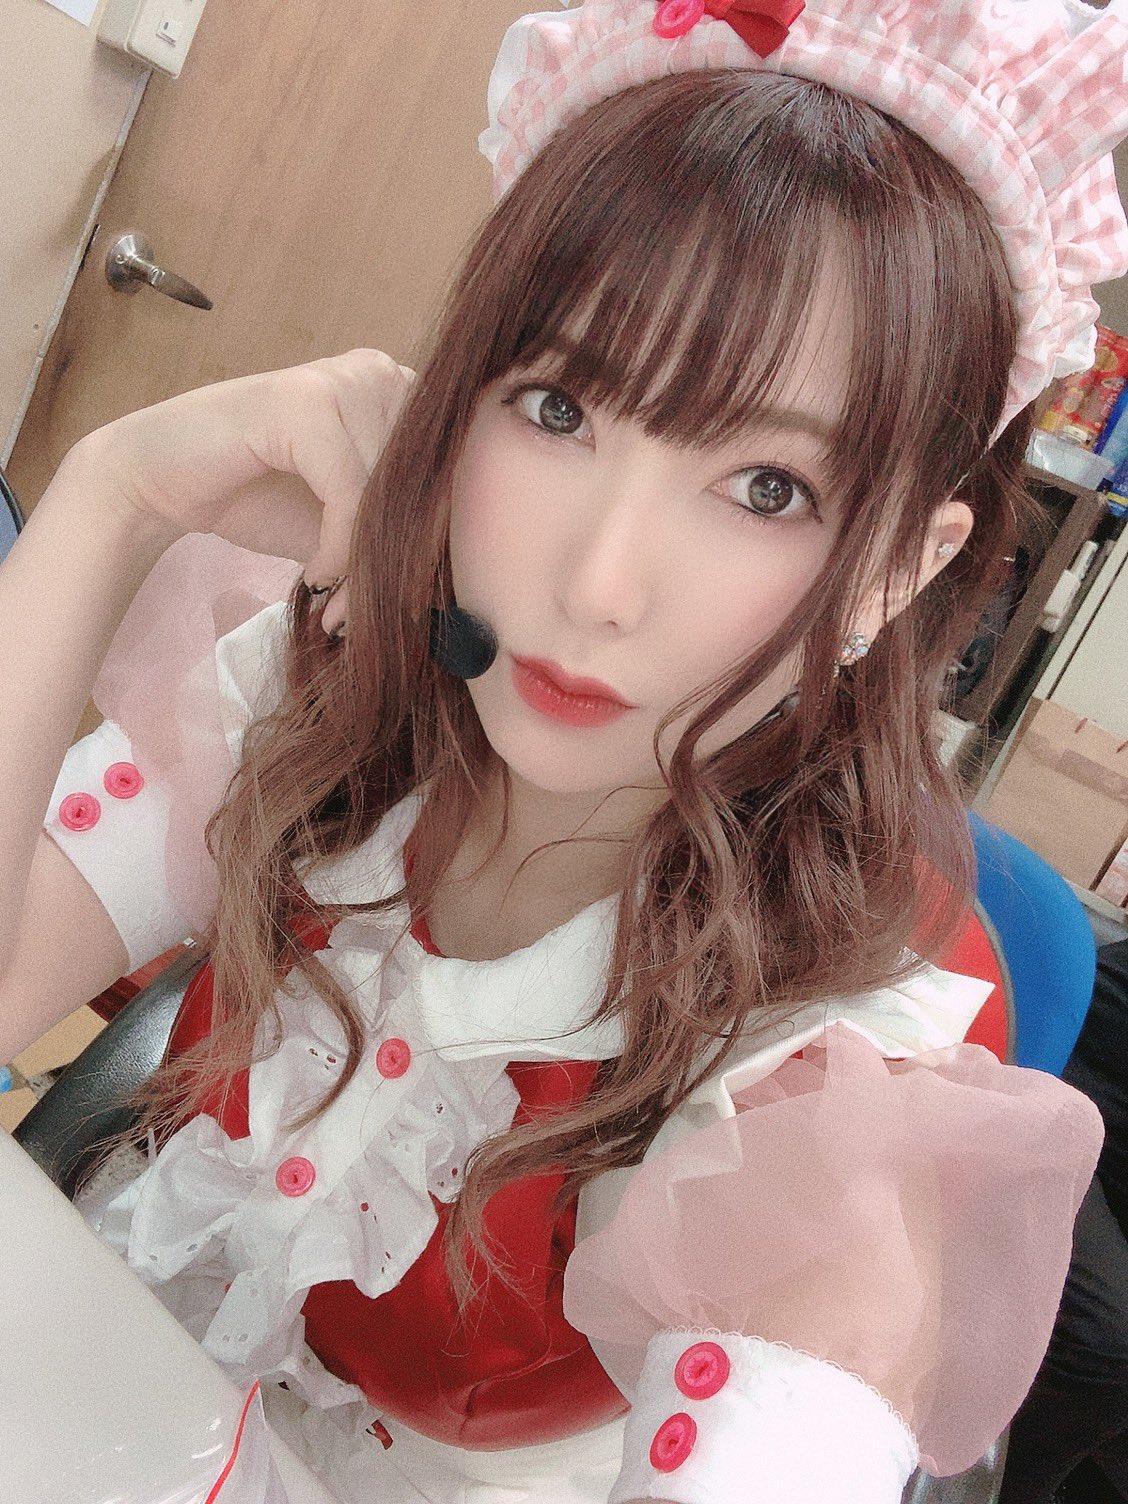 hatano_yui 1188022218313199616_p2